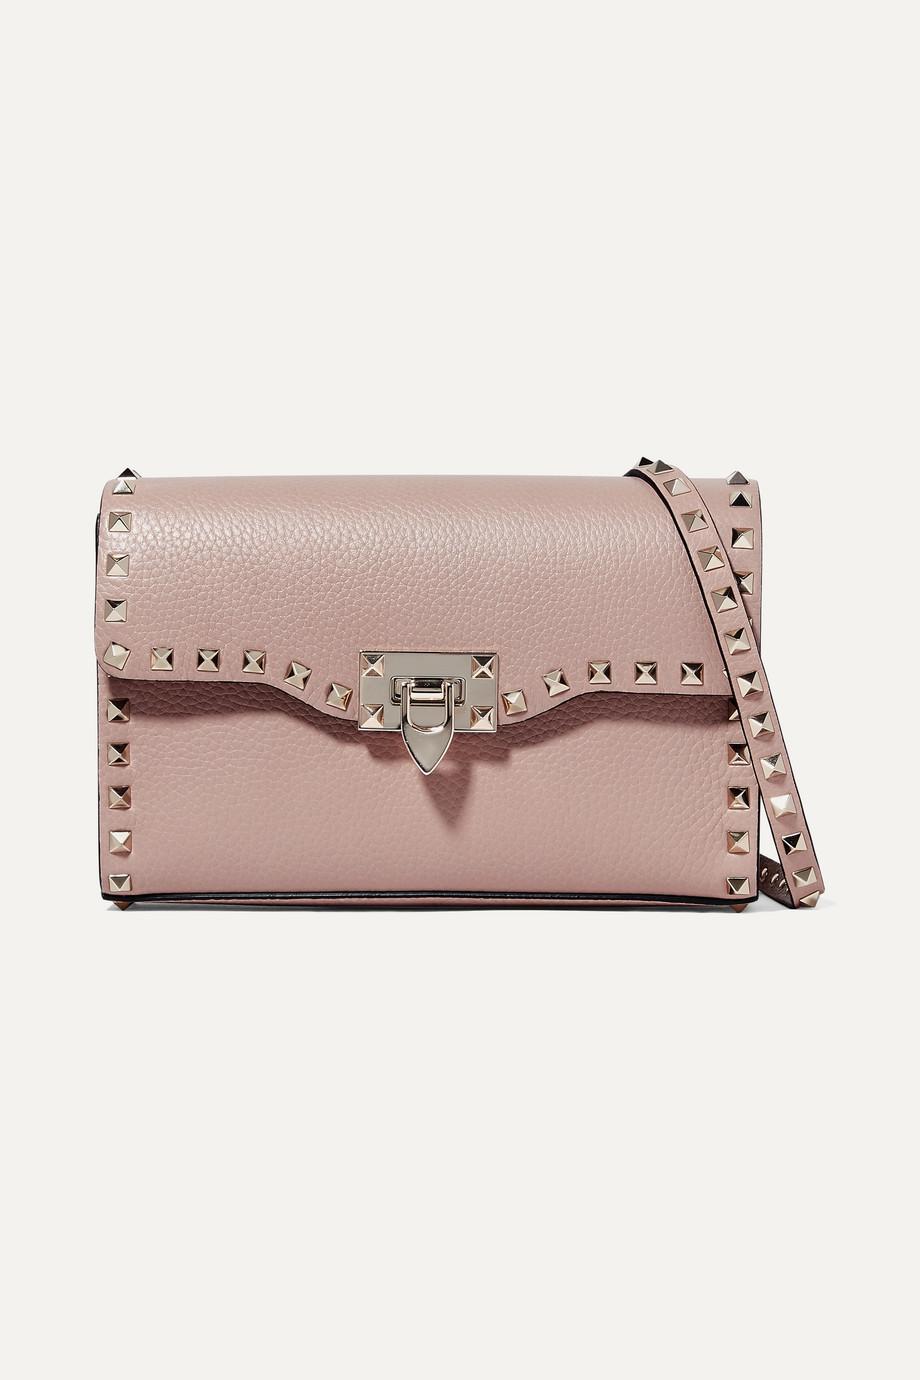 Valentino Valentino Garavani The Rockstud small textured-leather shoulder bag